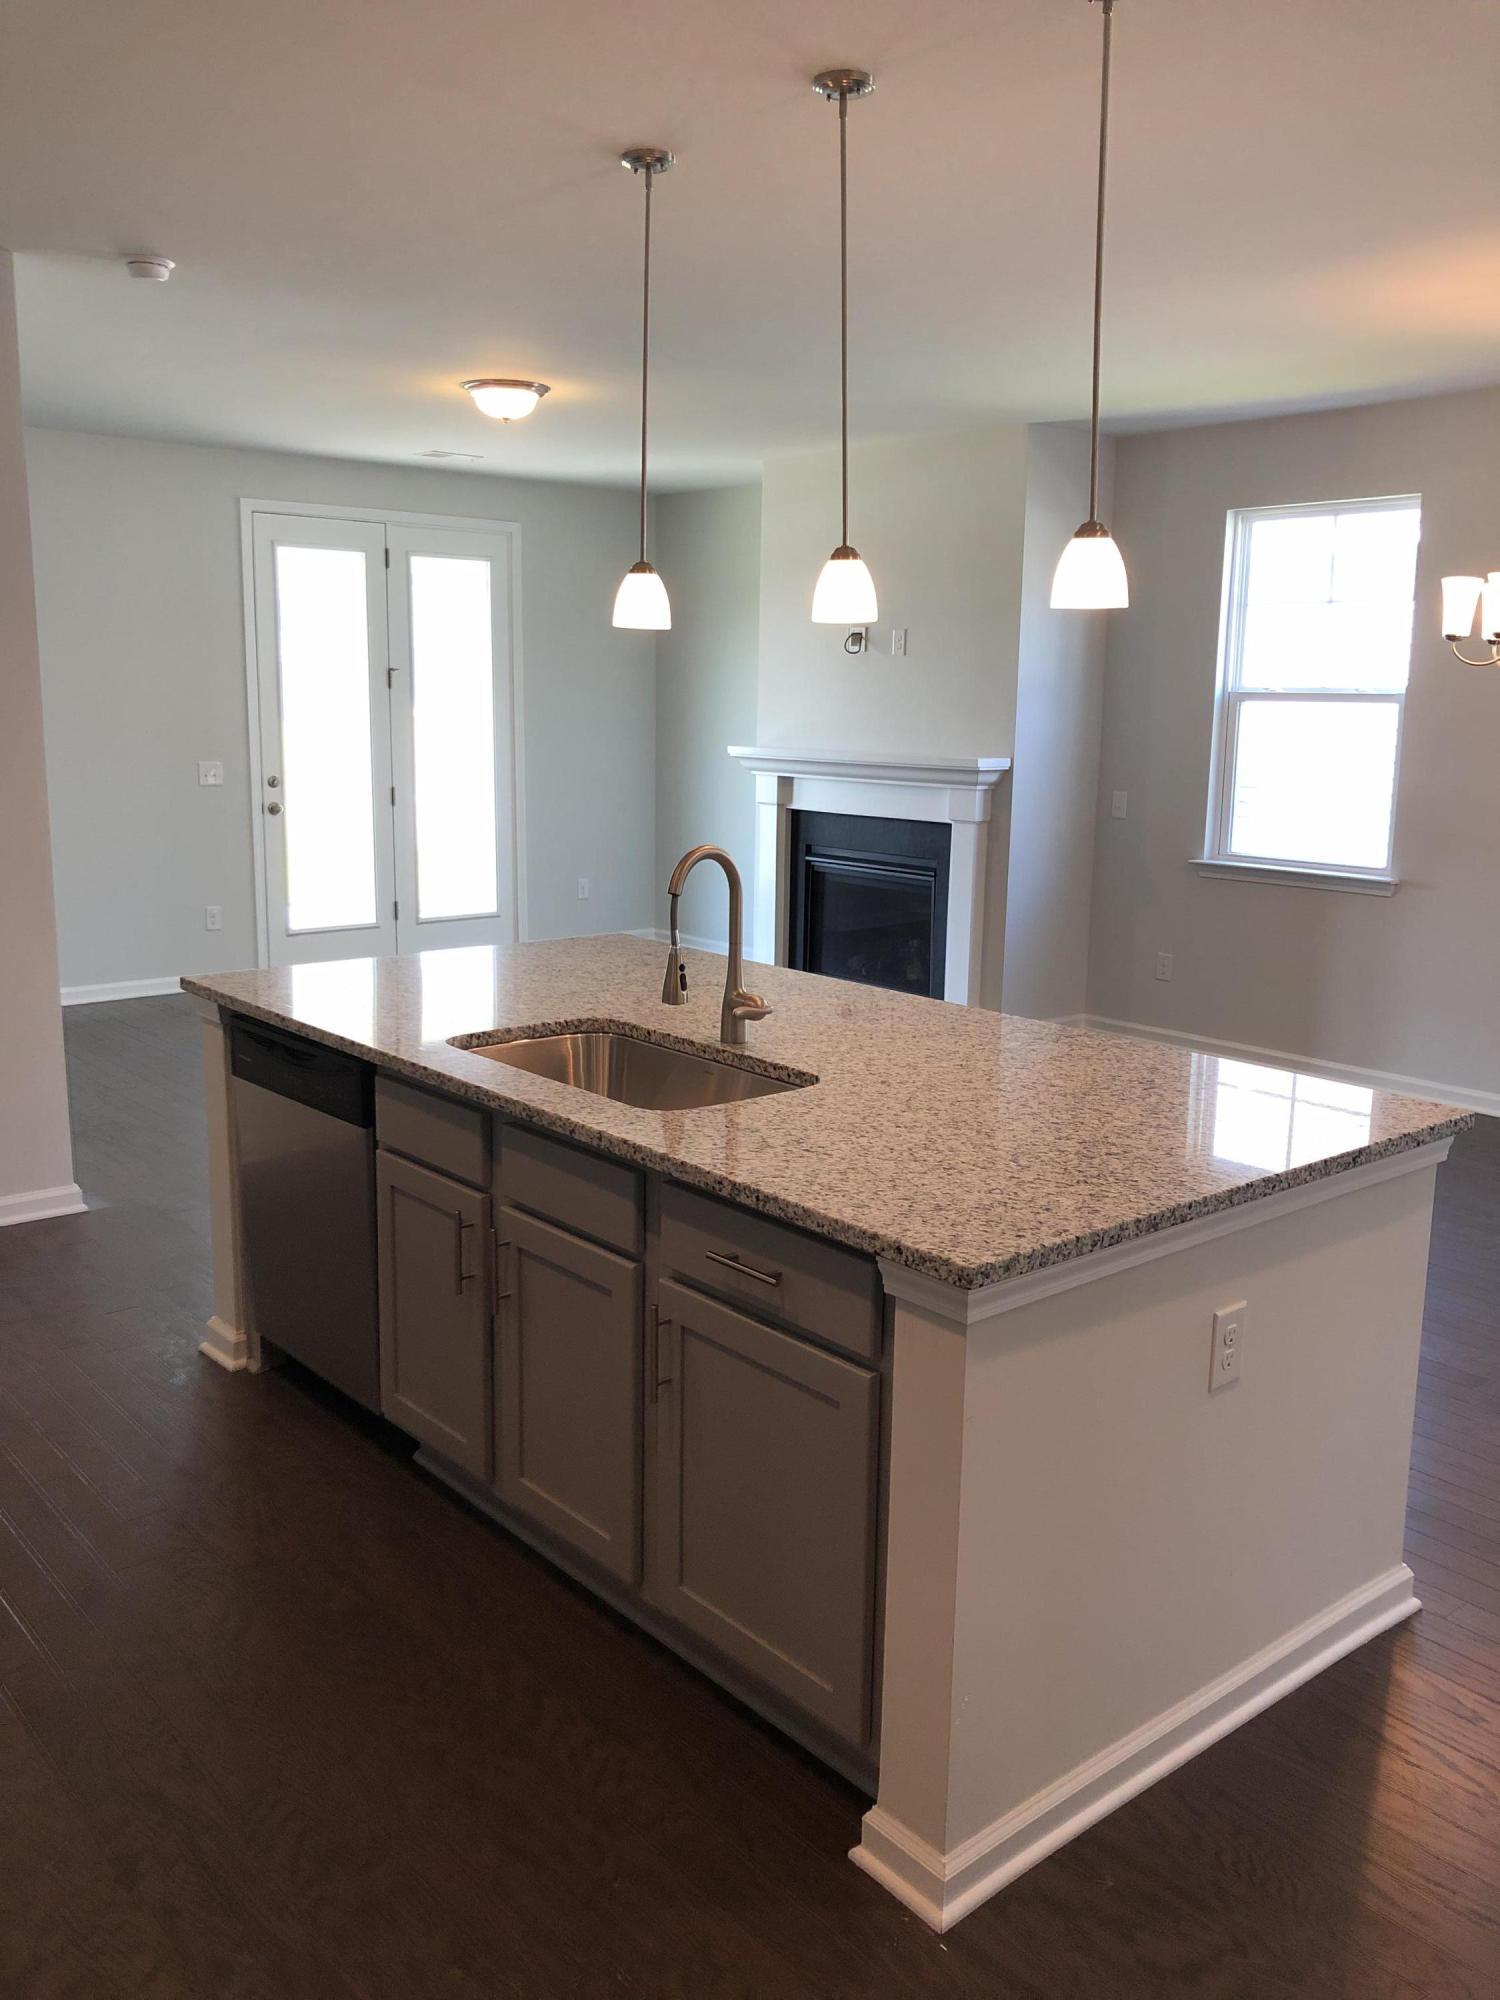 Cane Bay Plantation Homes For Sale - 454 Zenith, Summerville, SC - 12